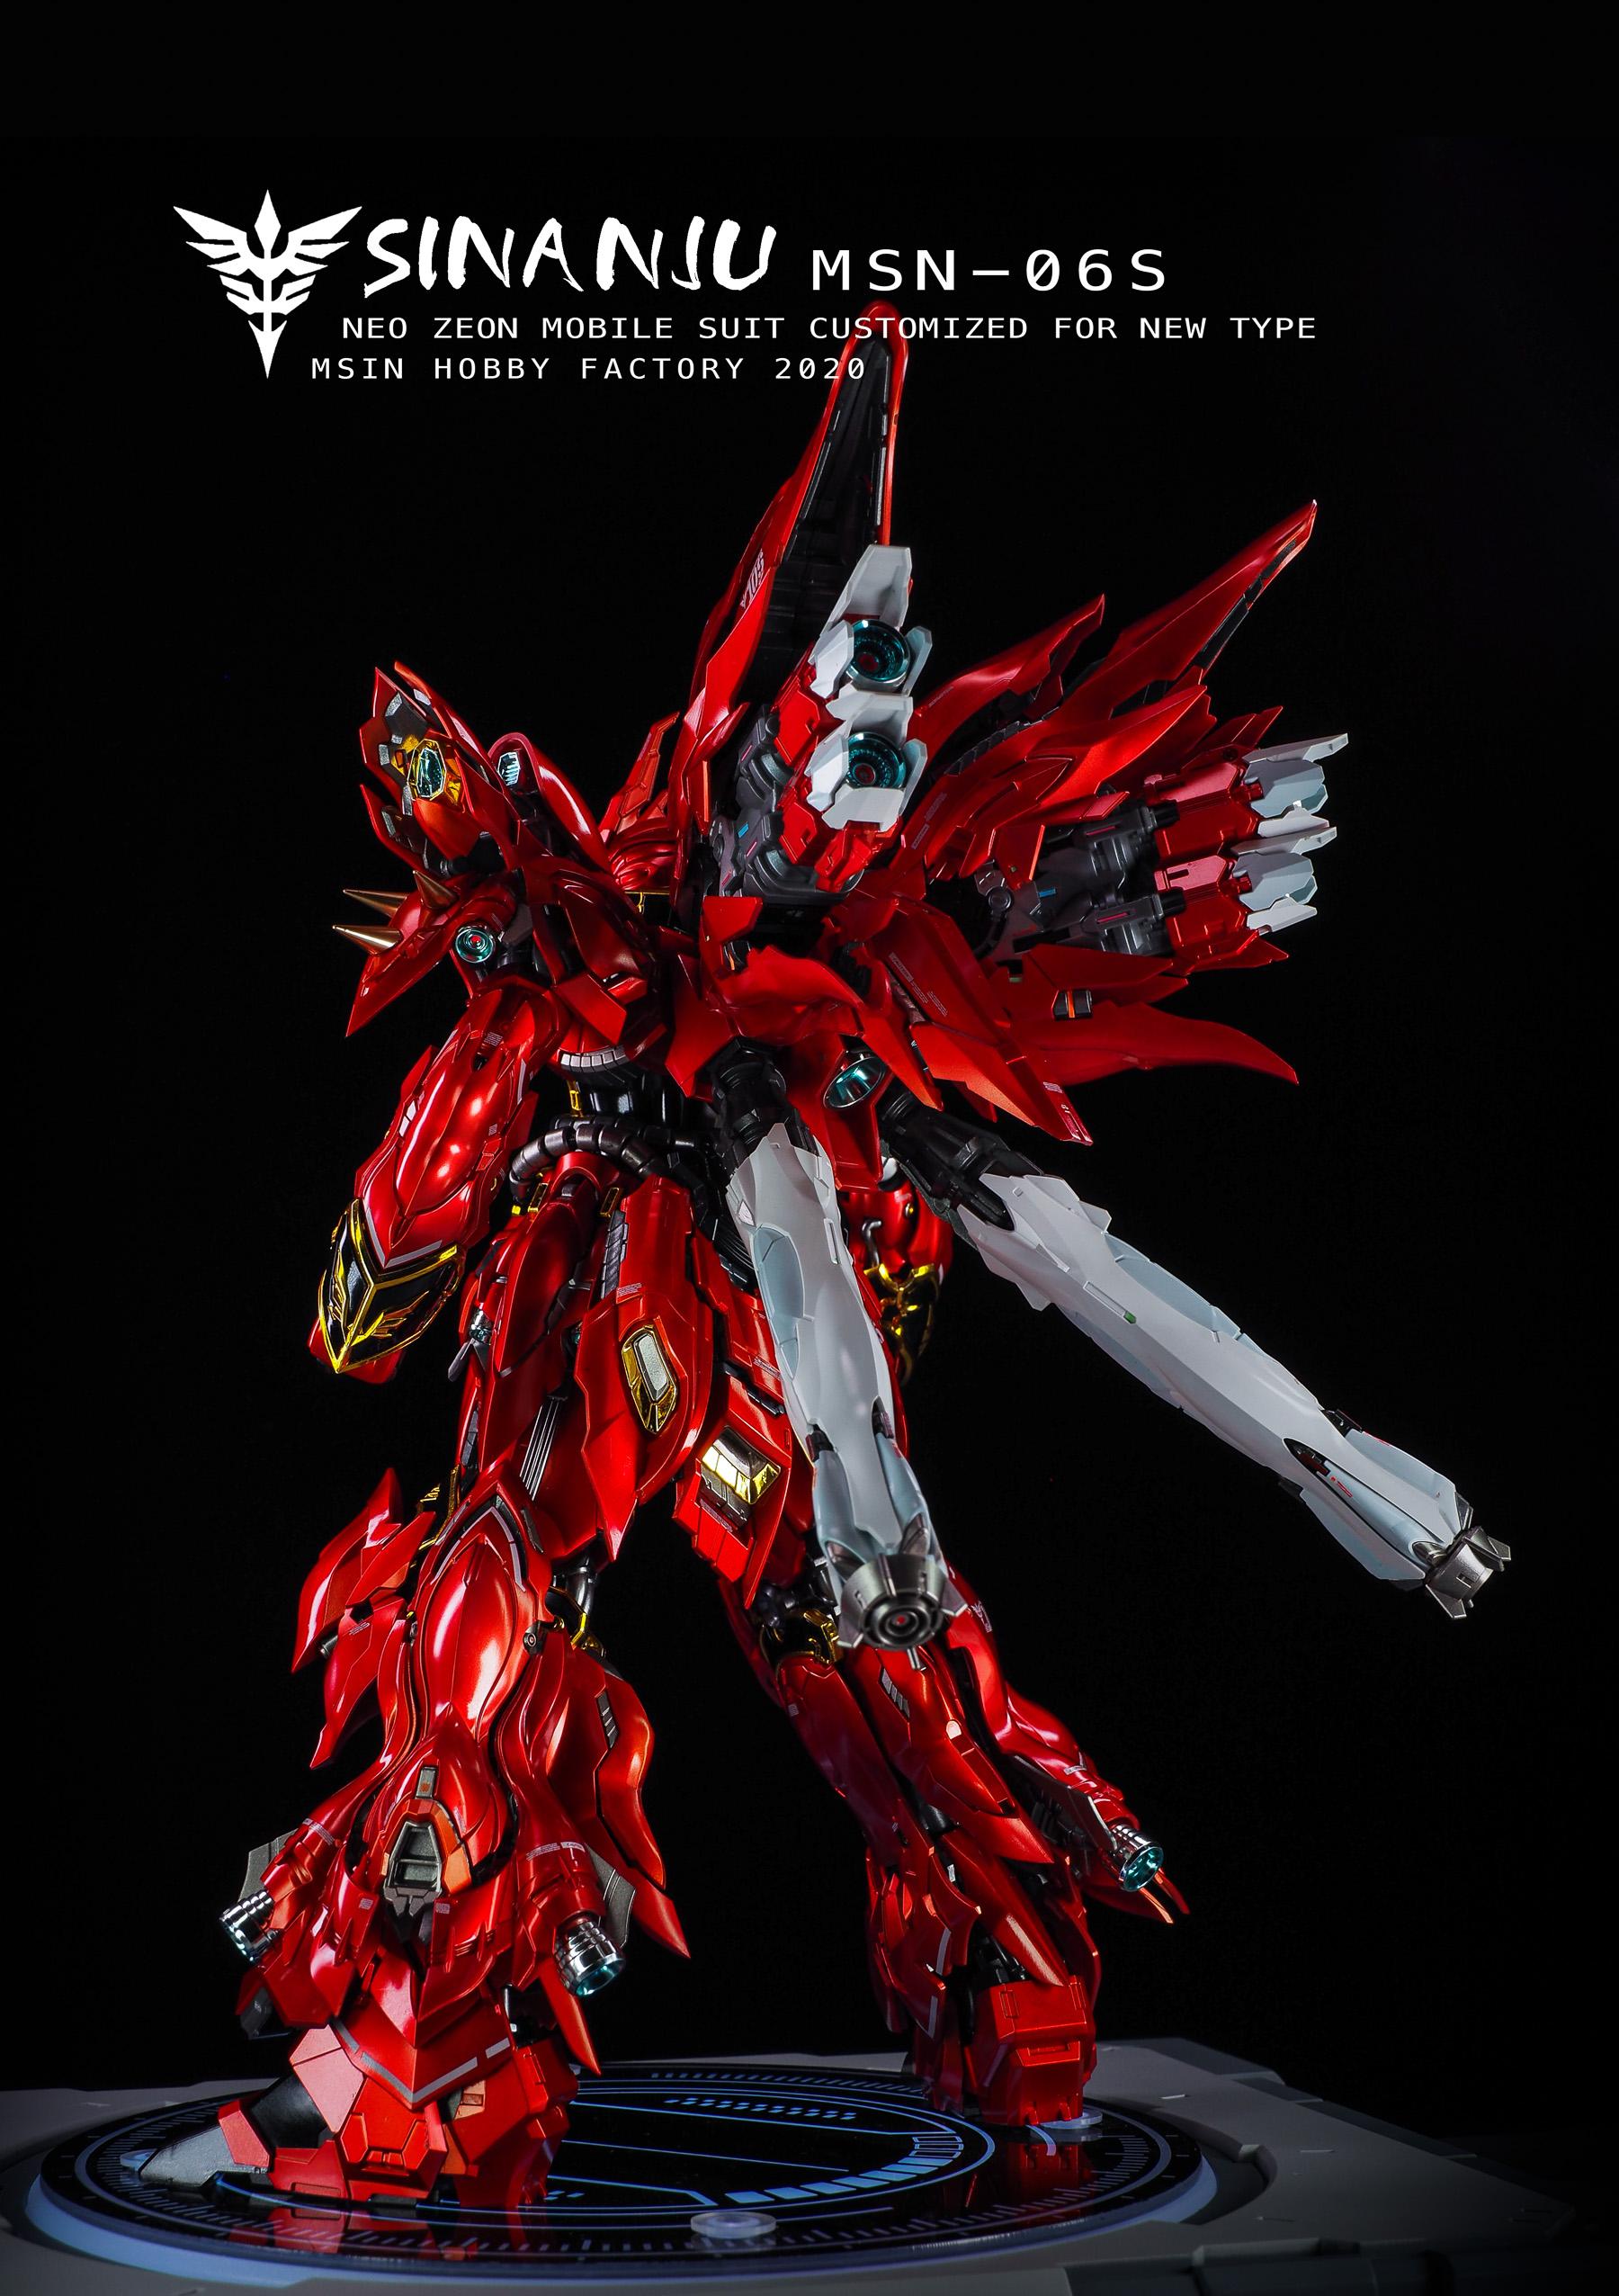 S437_6_takumi_sinanju_red_003.jpg